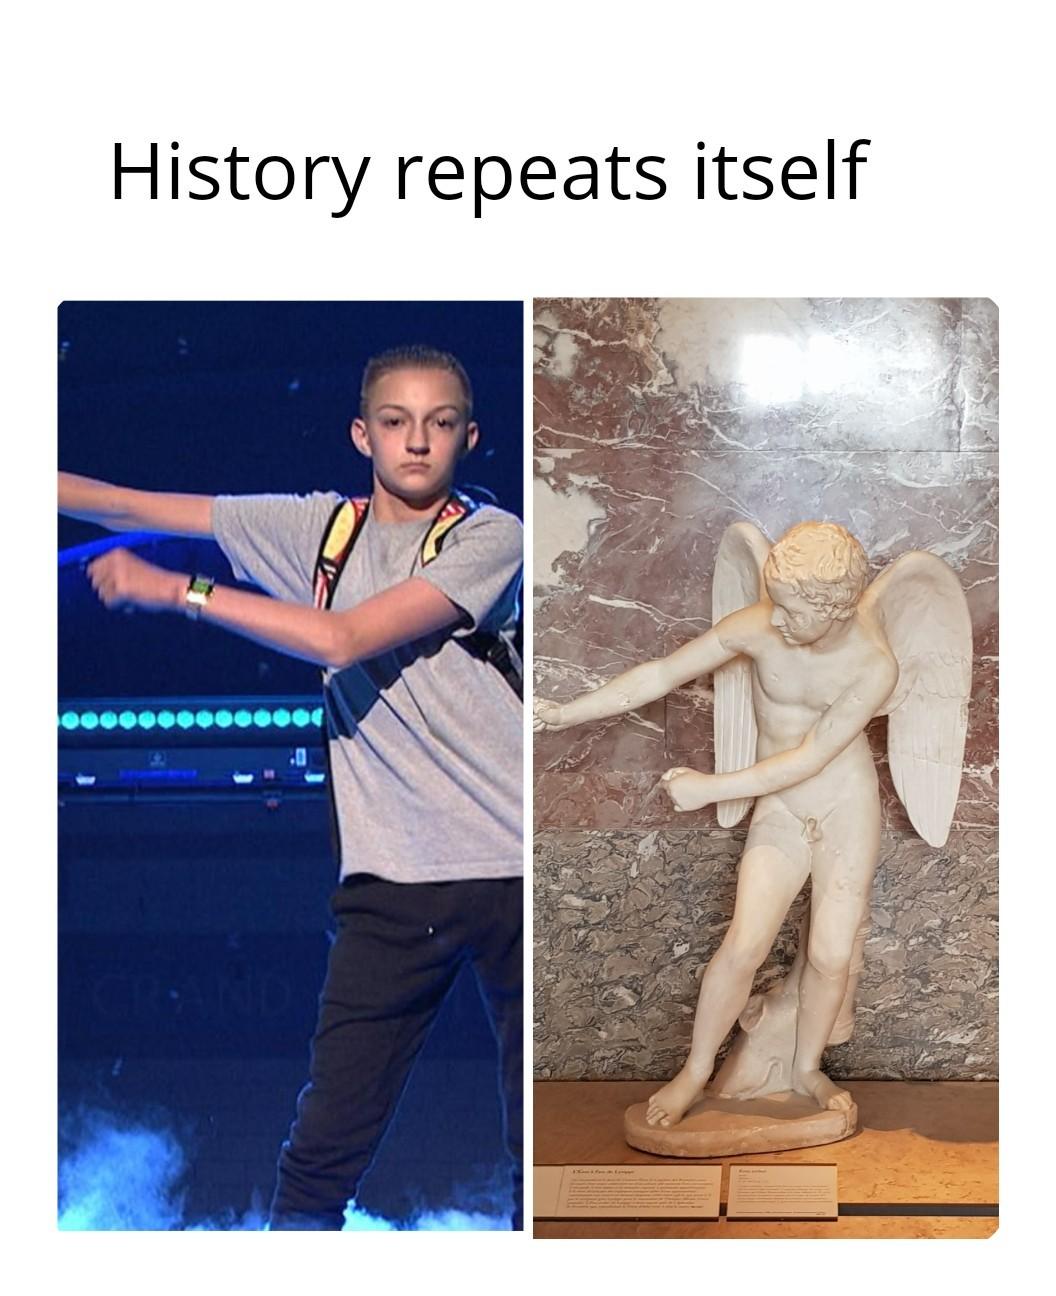 Flossing greek statue - meme